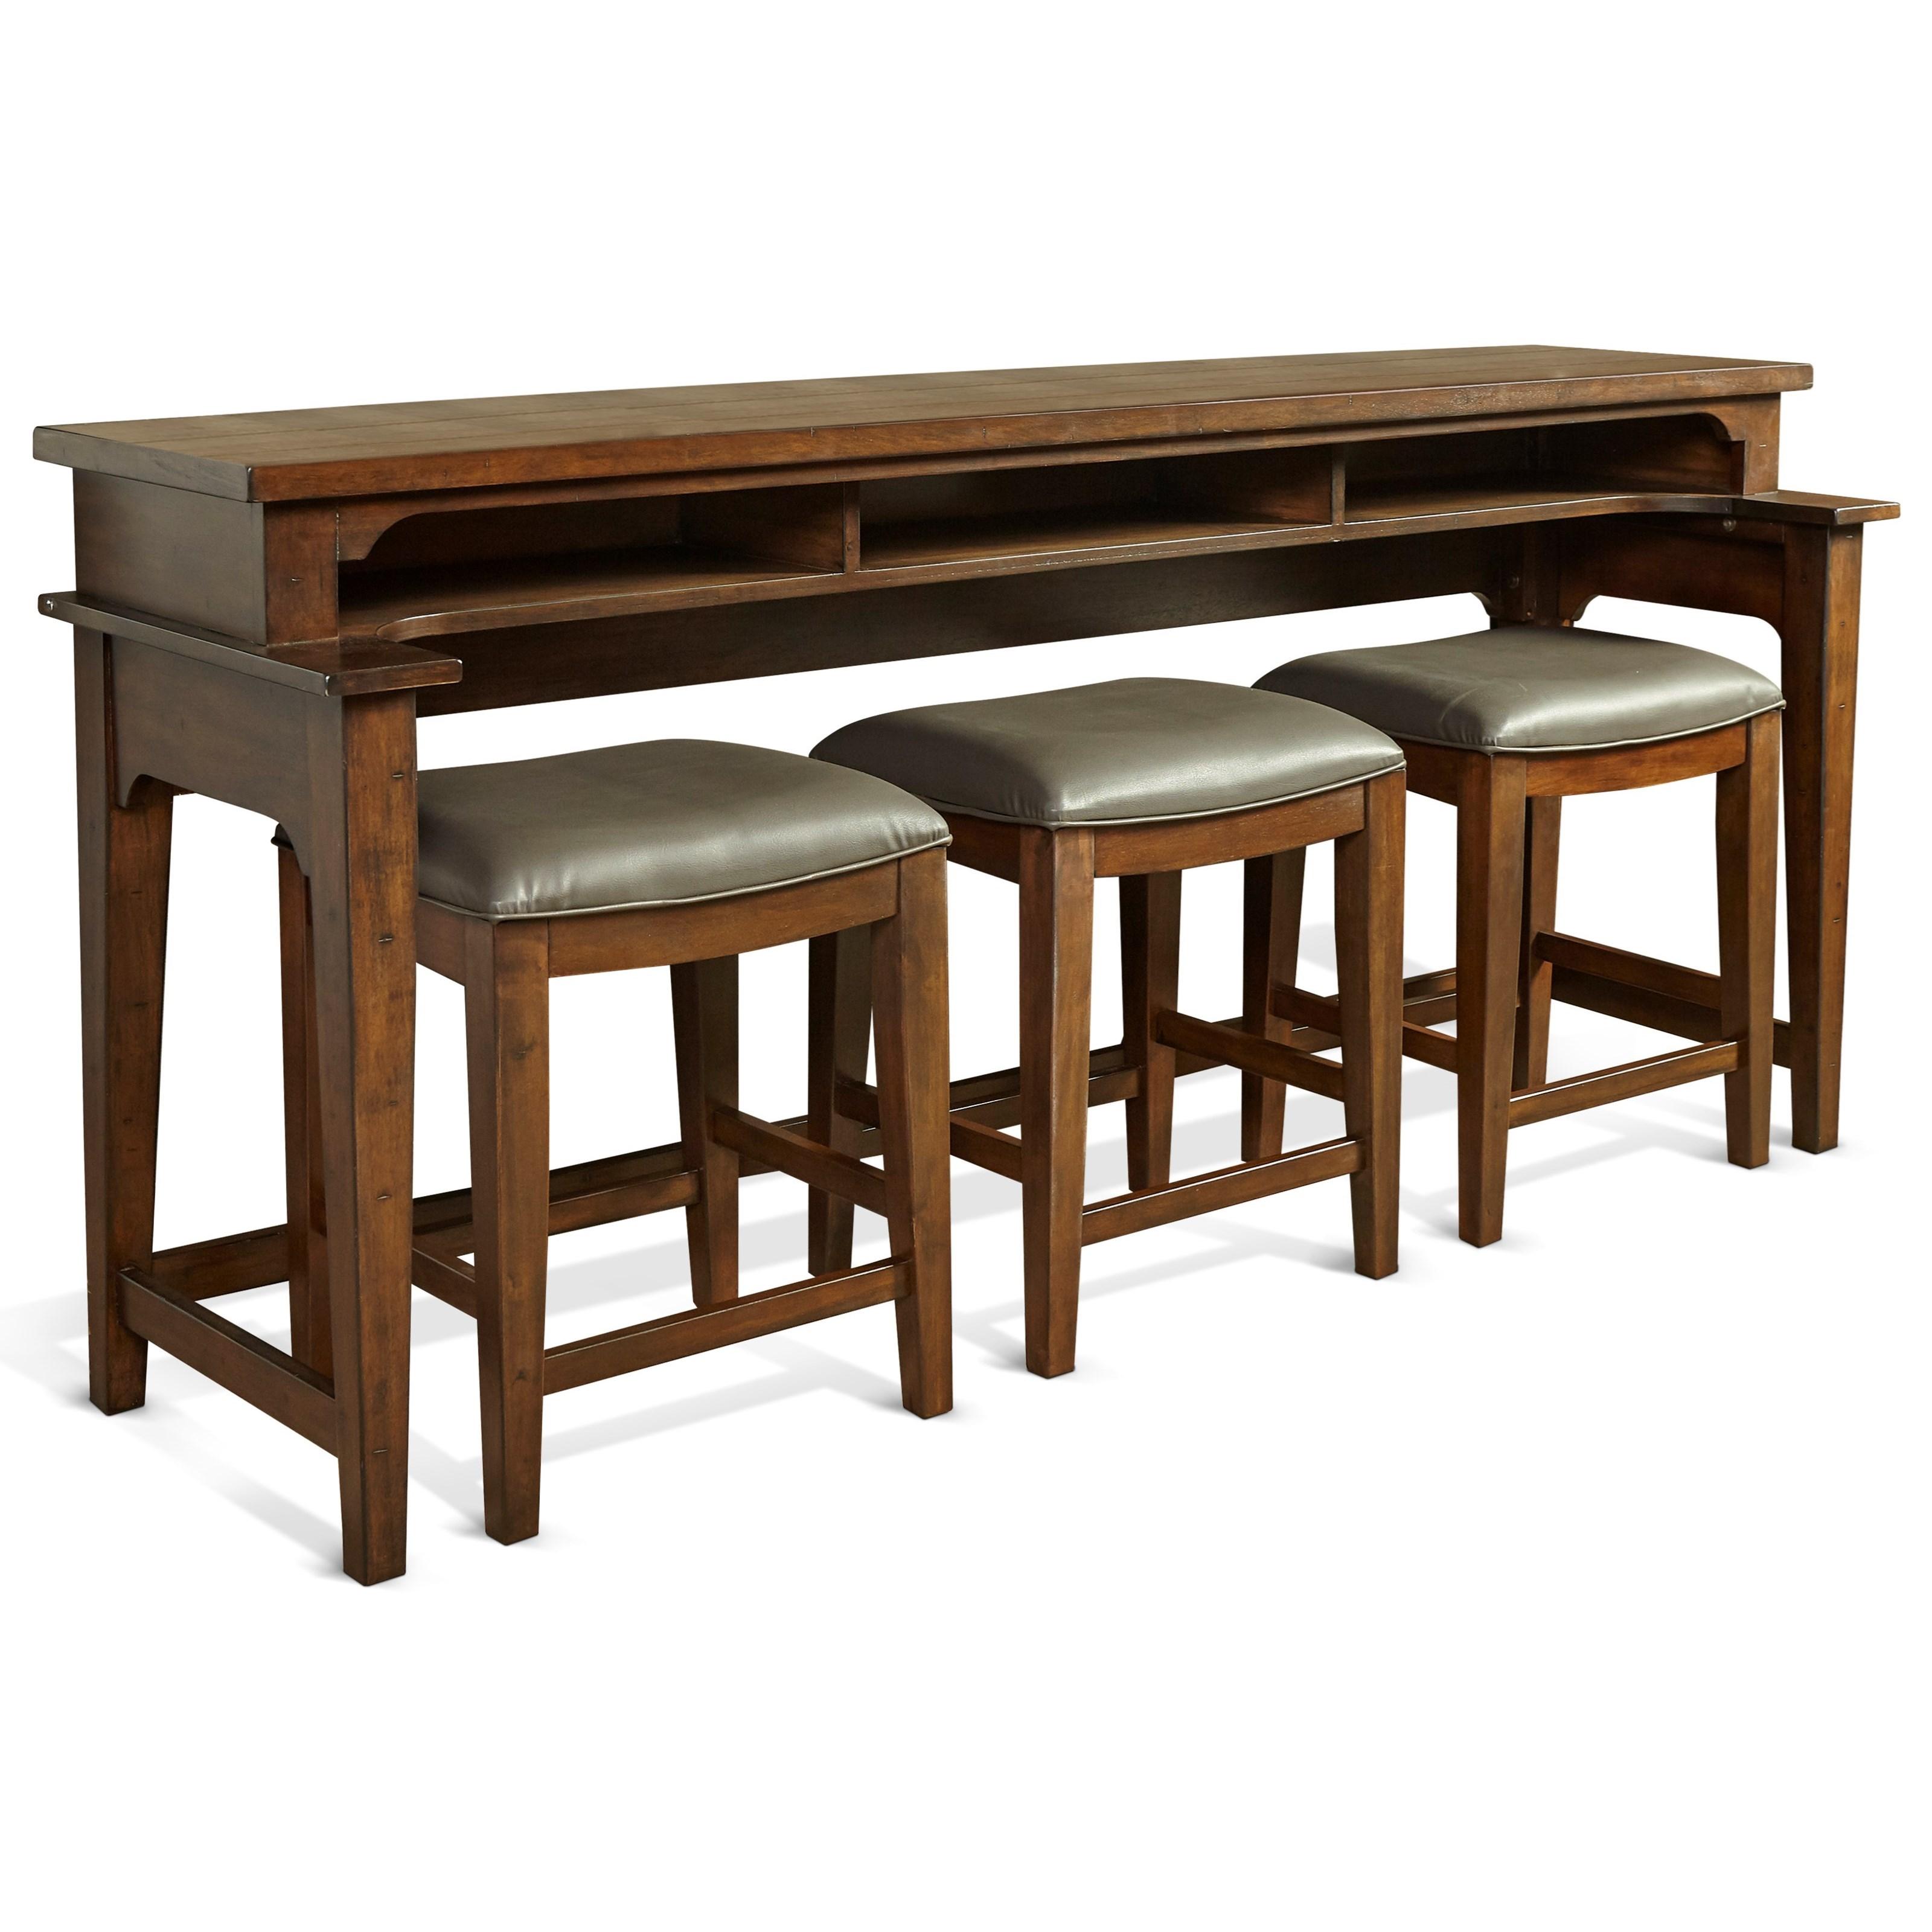 Bar Table And Chair Set: Sunny Designs Richmond Console Bar Table And Chair Set